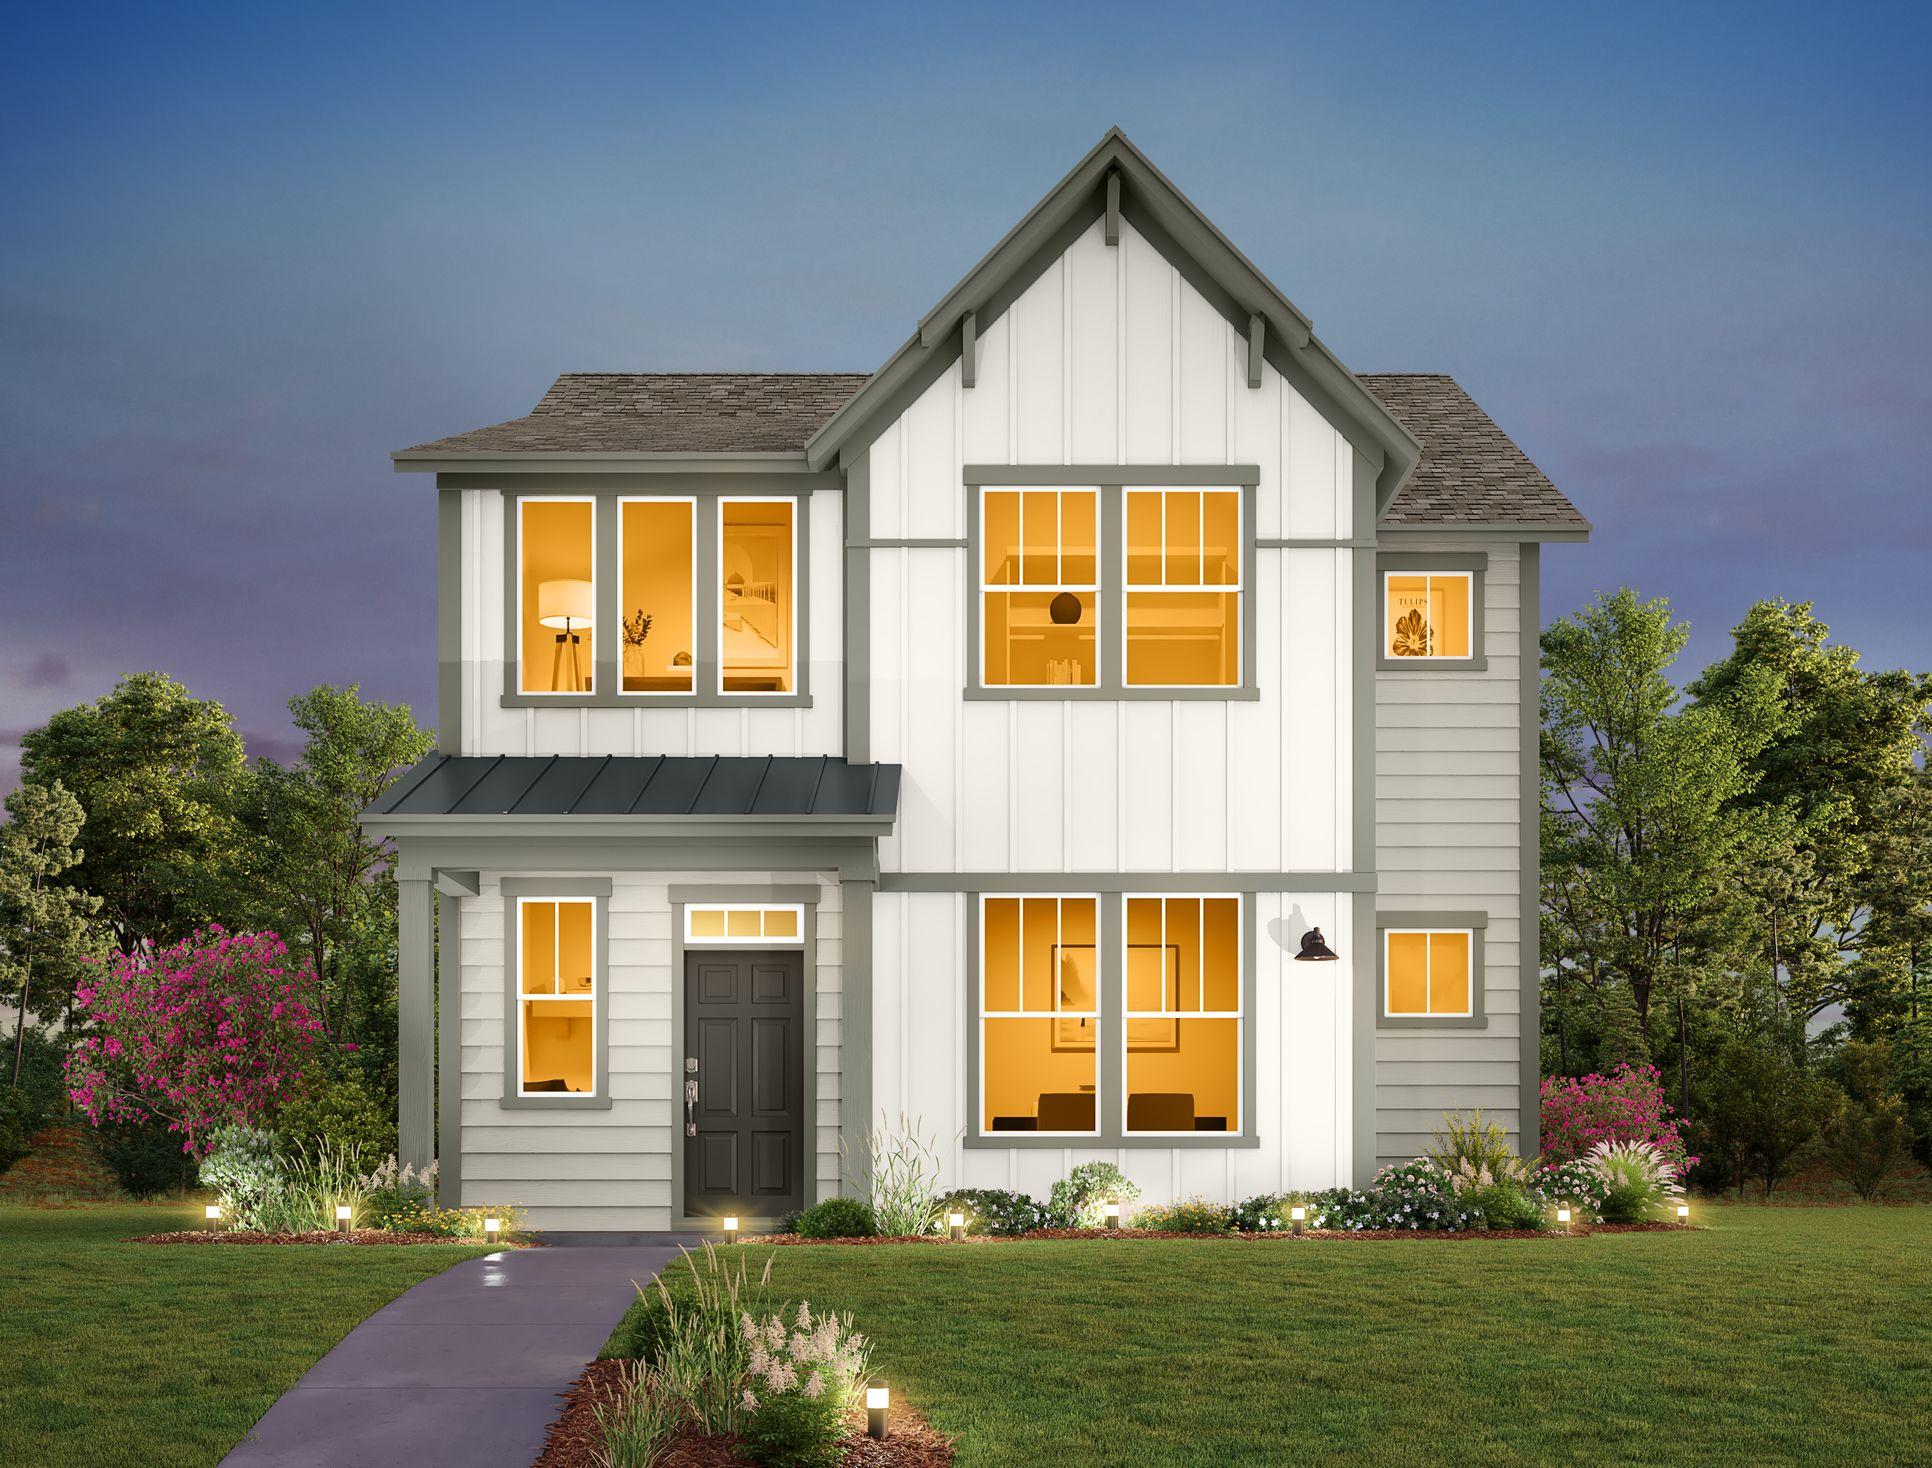 Exterior:Mockingbird Park Cottages - Falcon Elevation Image 1